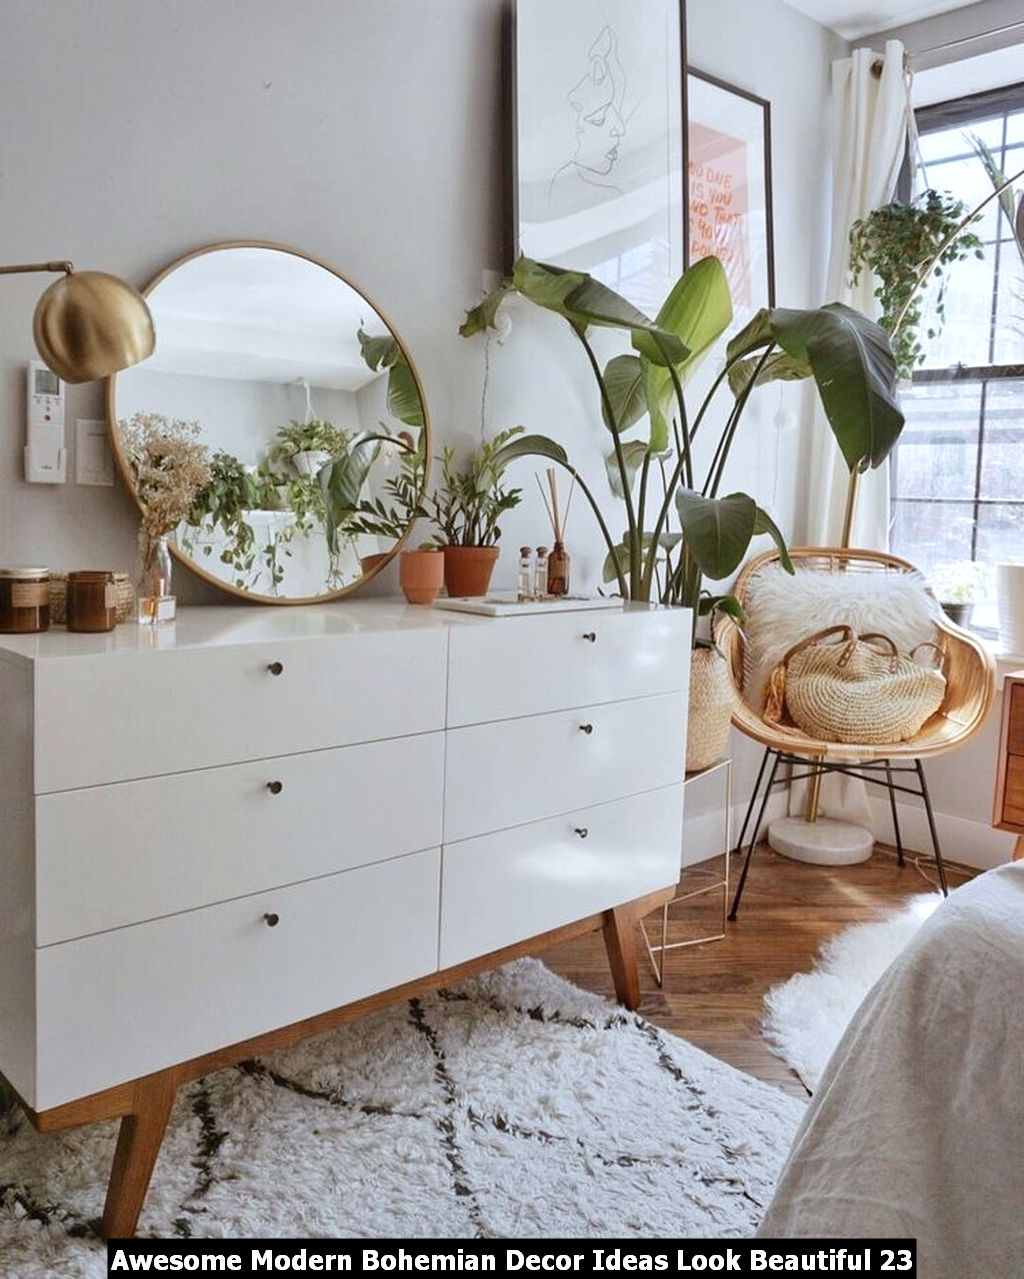 Awesome Modern Bohemian Decor Ideas Look Beautiful 23